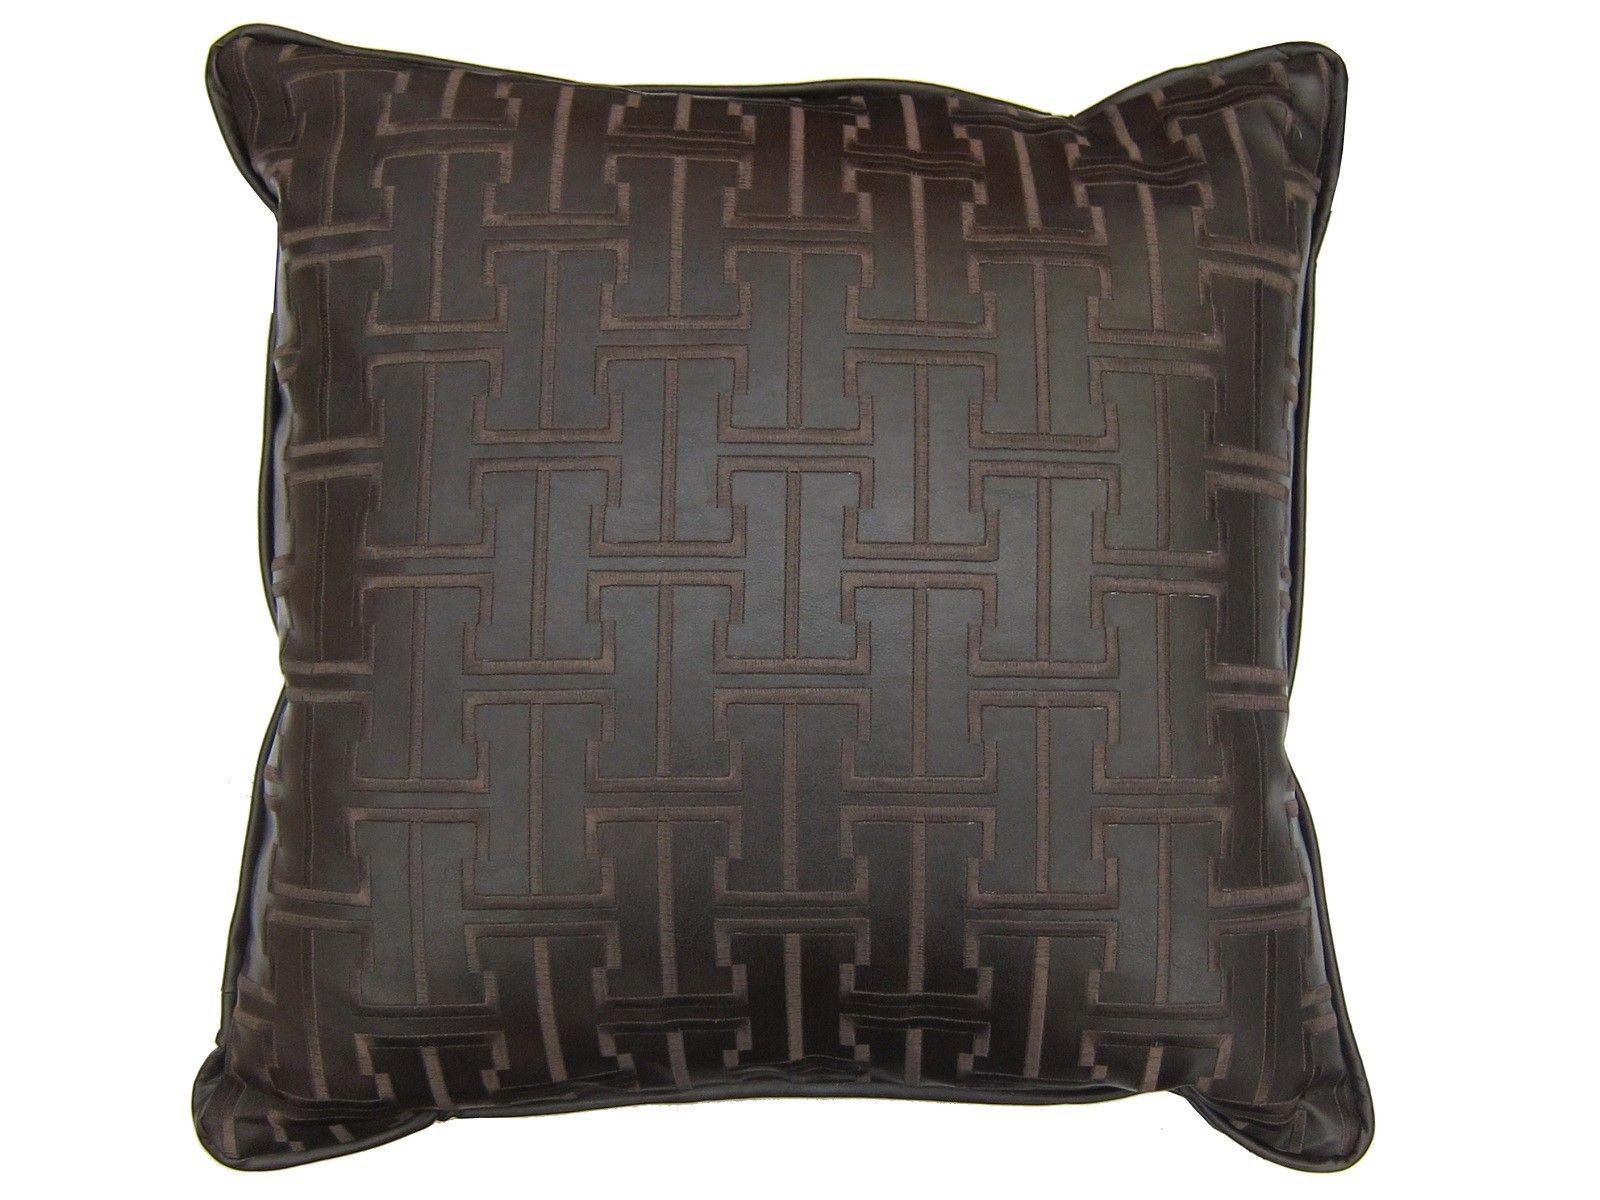 Rodeo Home Throw Pillow : Drake pillow from Rodeo Home Pillows Pinterest Pillows